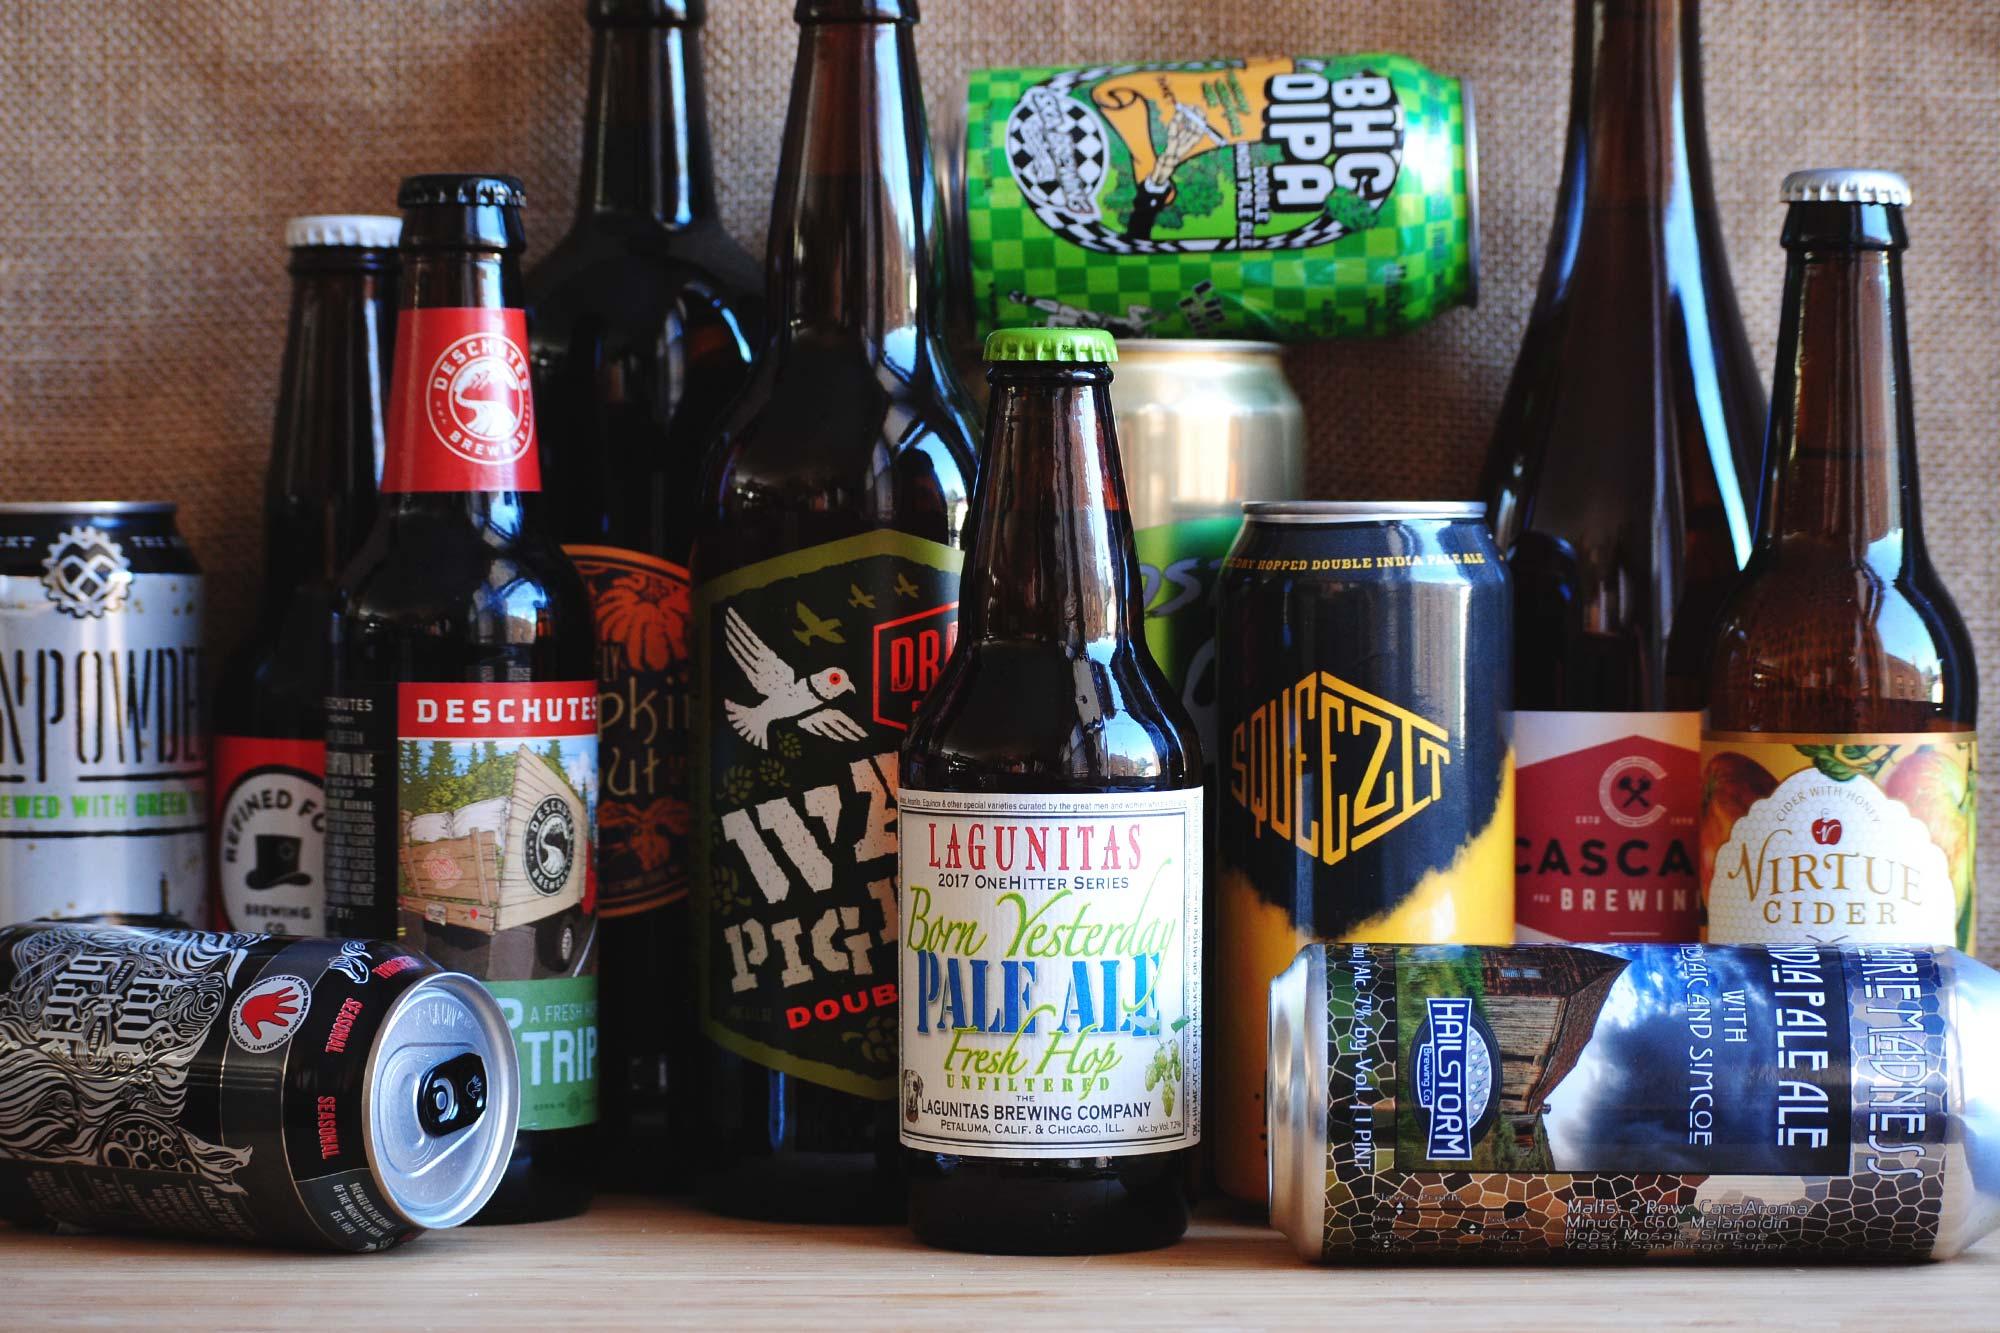 The Hop Reviews Vol. 18:A November Beer Review